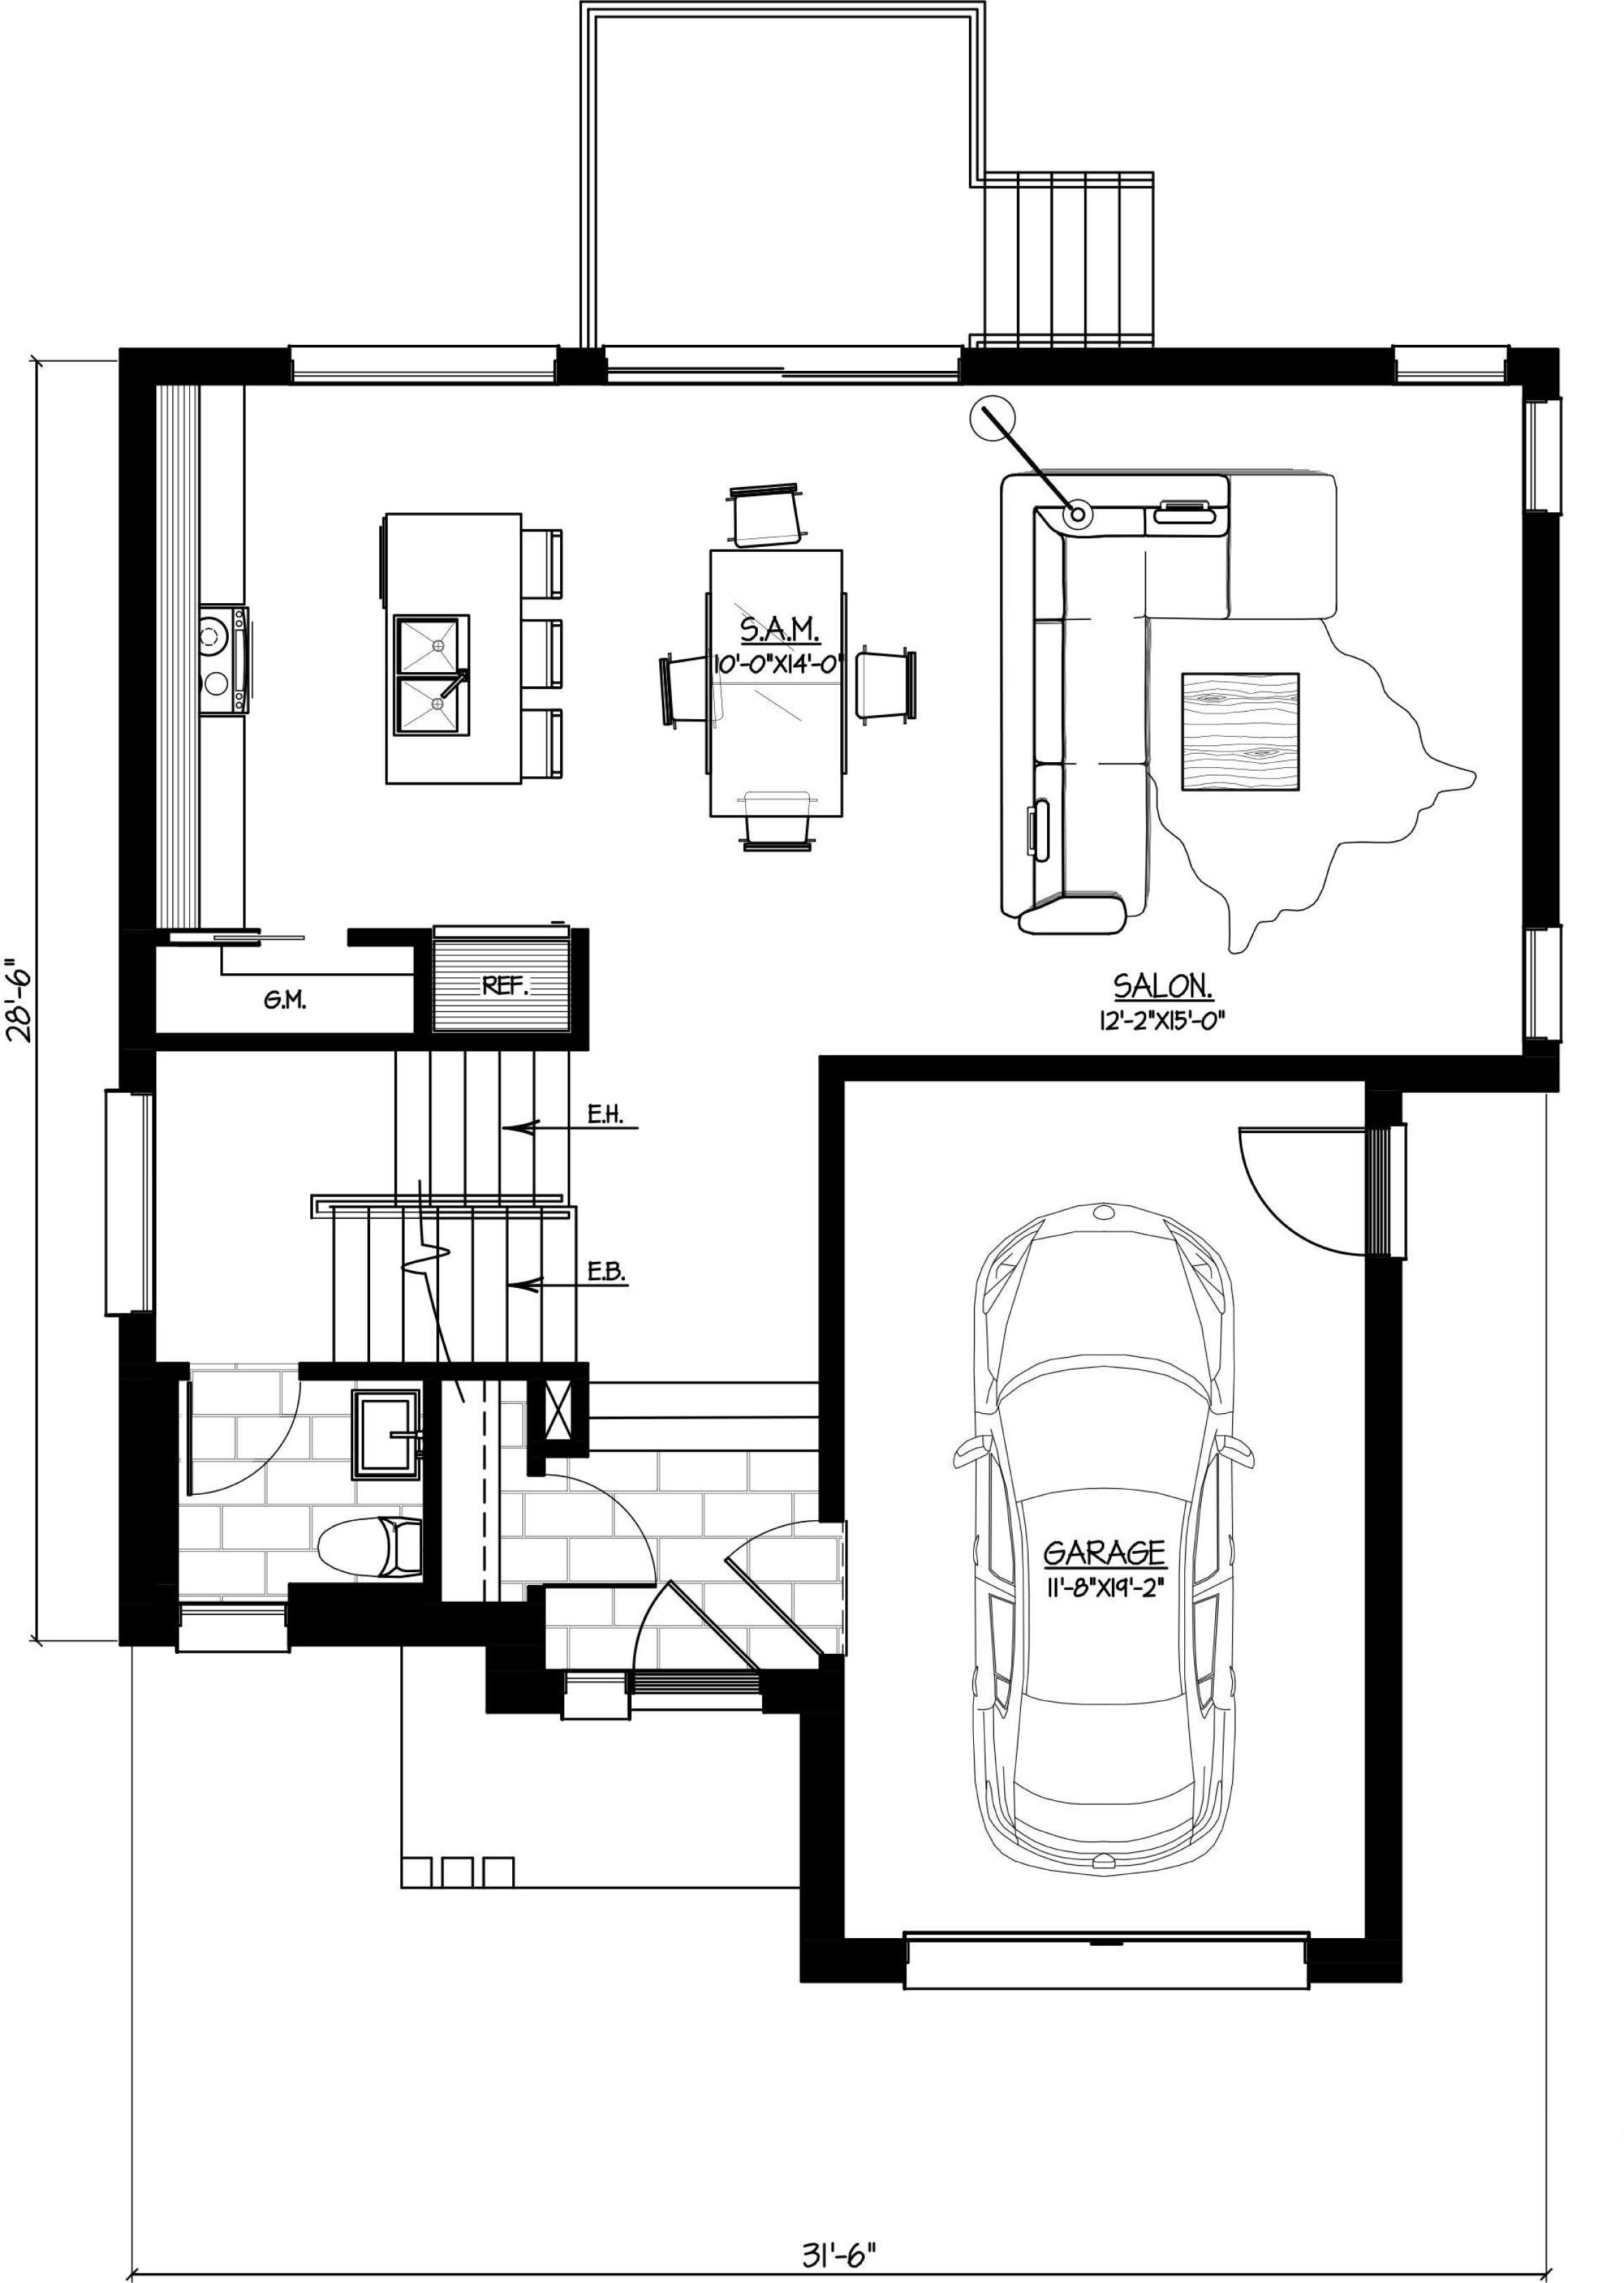 Les Habitations Innovatel maisons neuves Ste-Sophie modèle St-Martin I